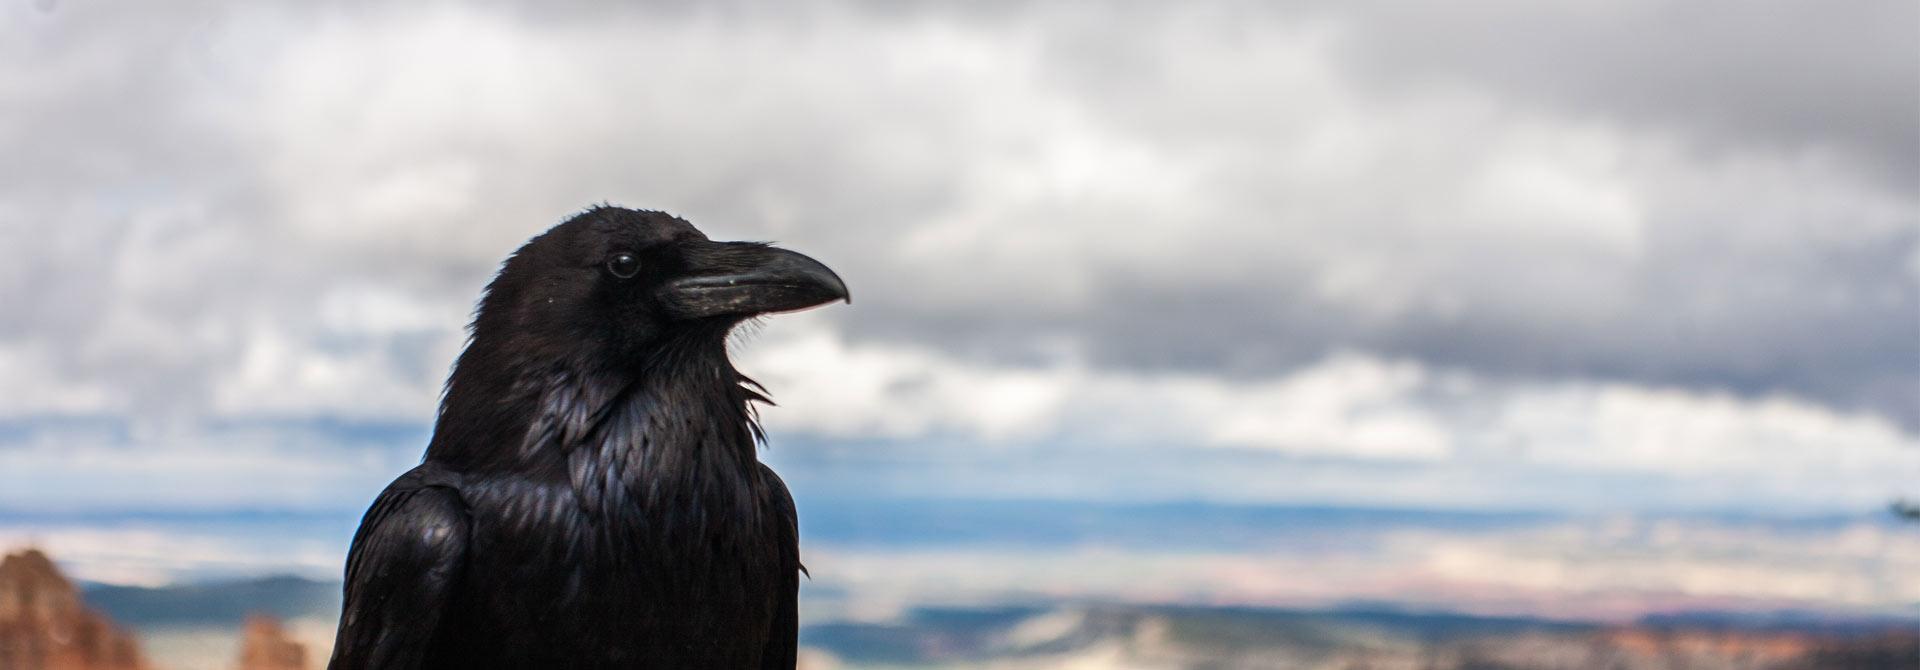 Corvid.Studio - Photo of crow by Tyler Quiring - Unsplash image